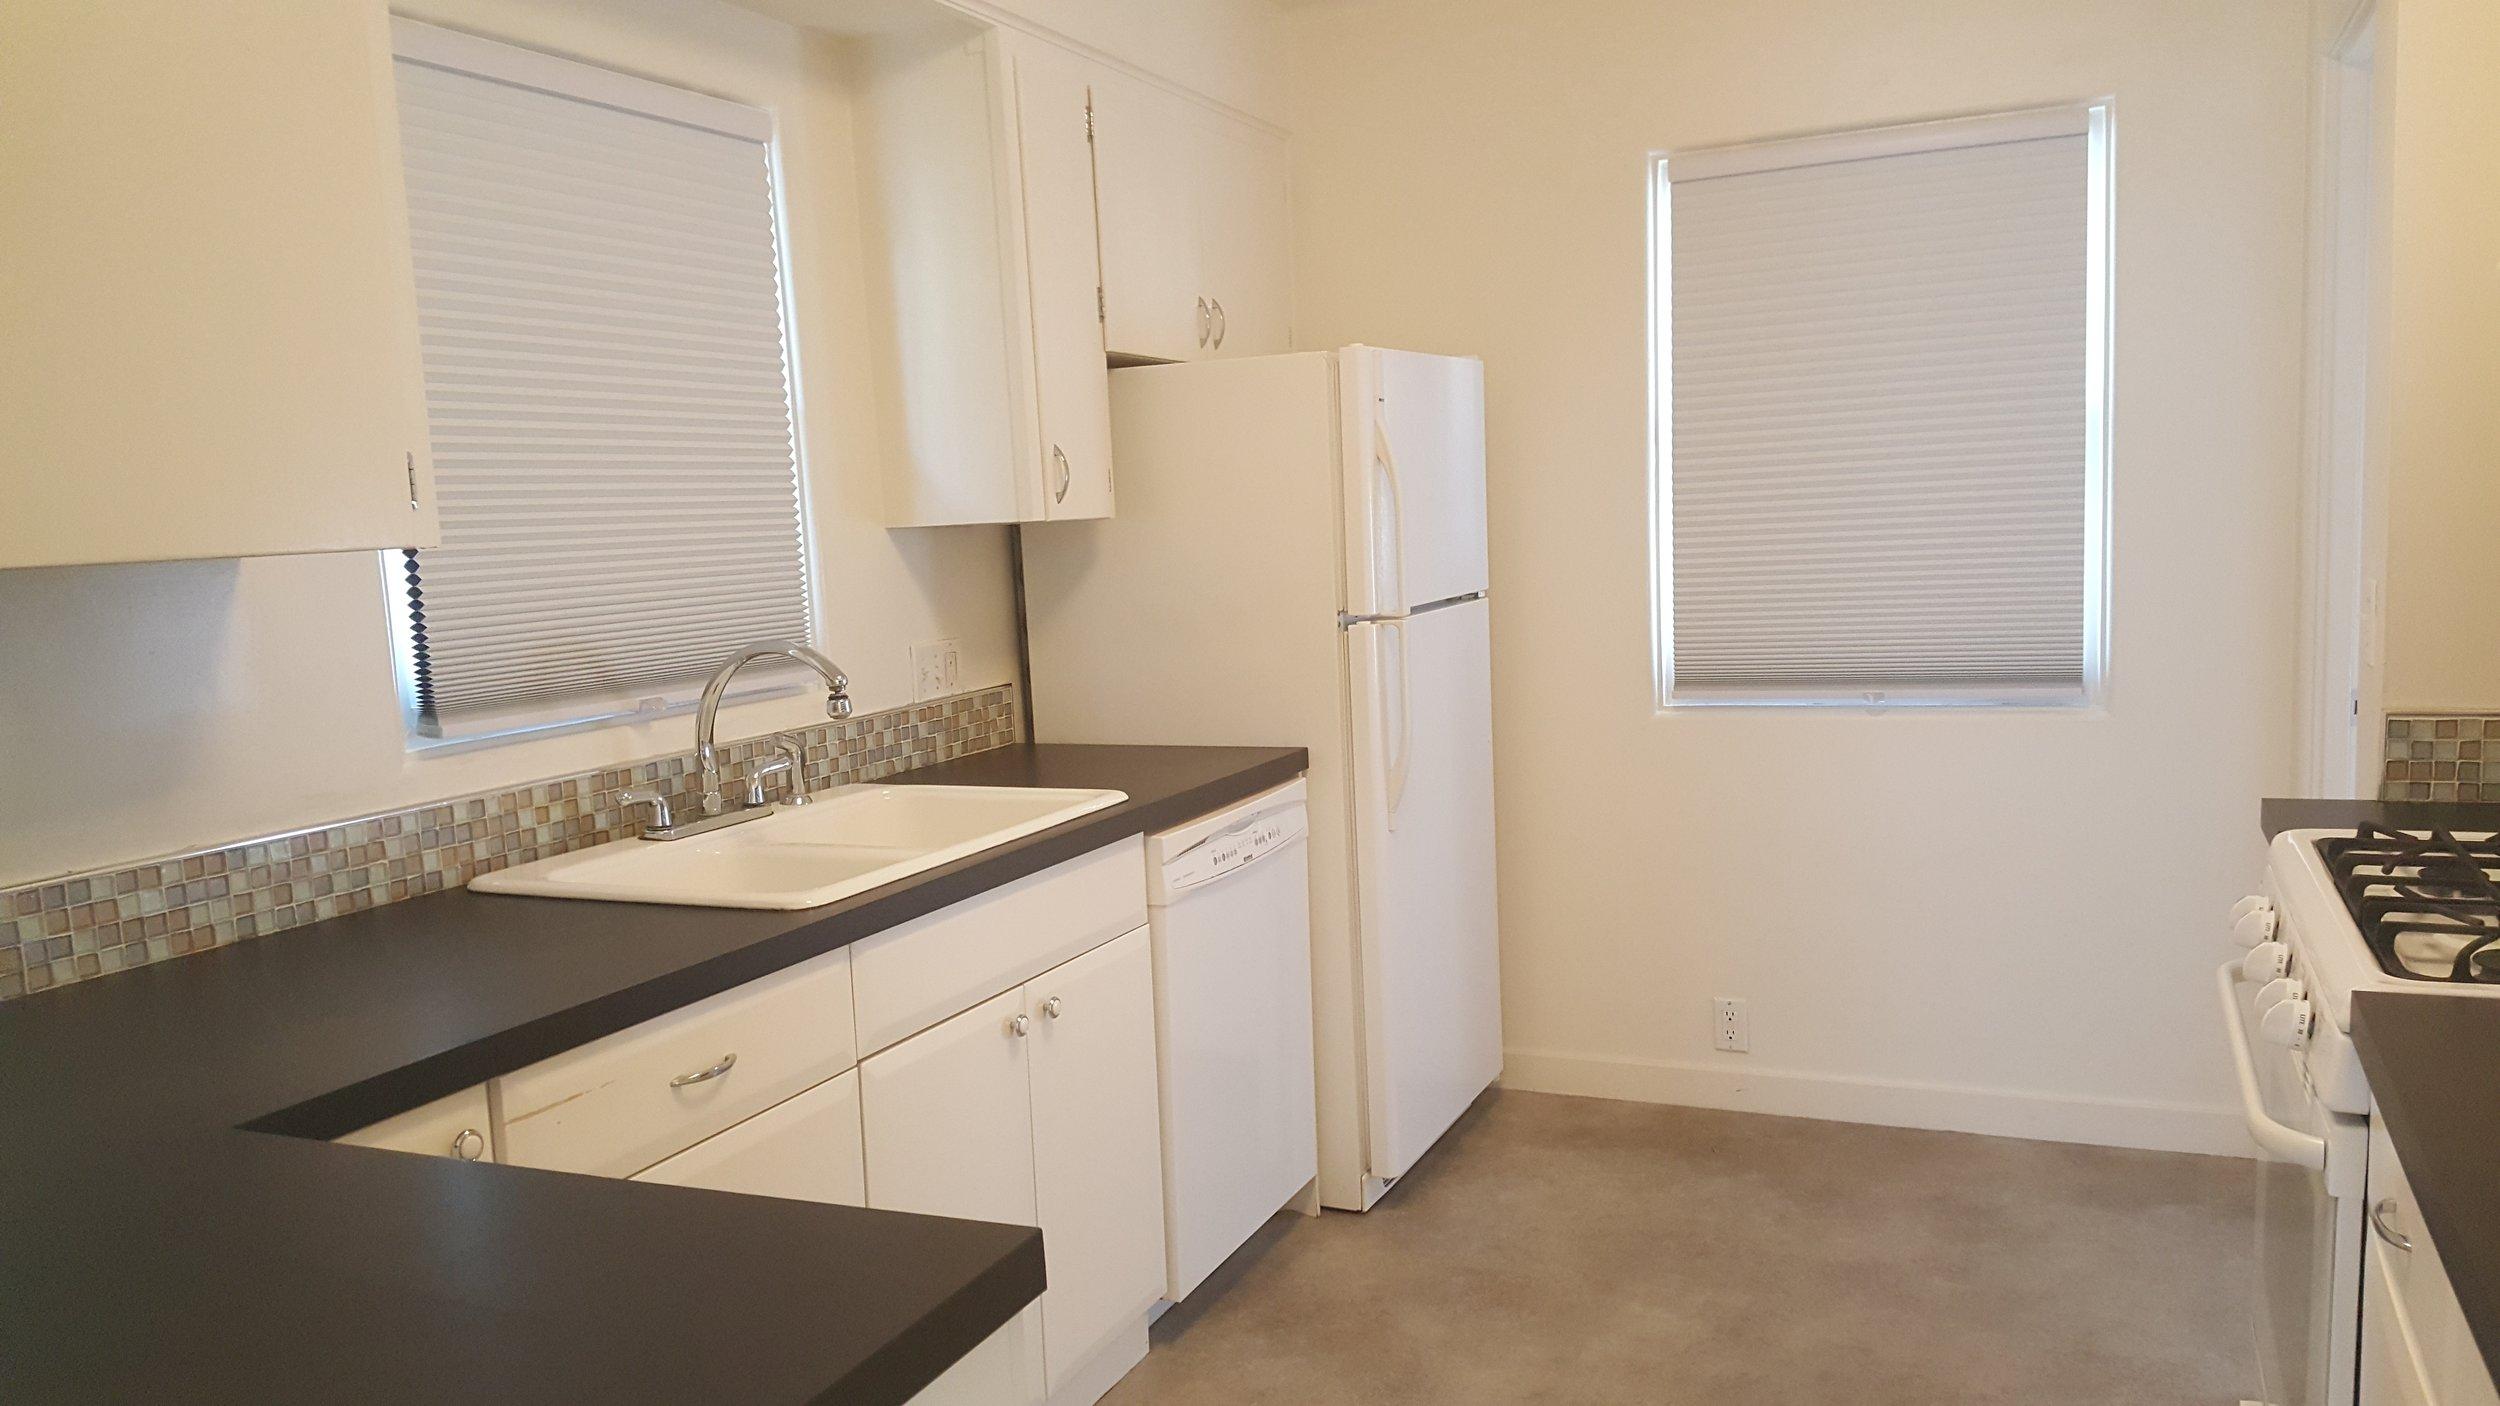 830 Woodford amazing kitchen.jpg